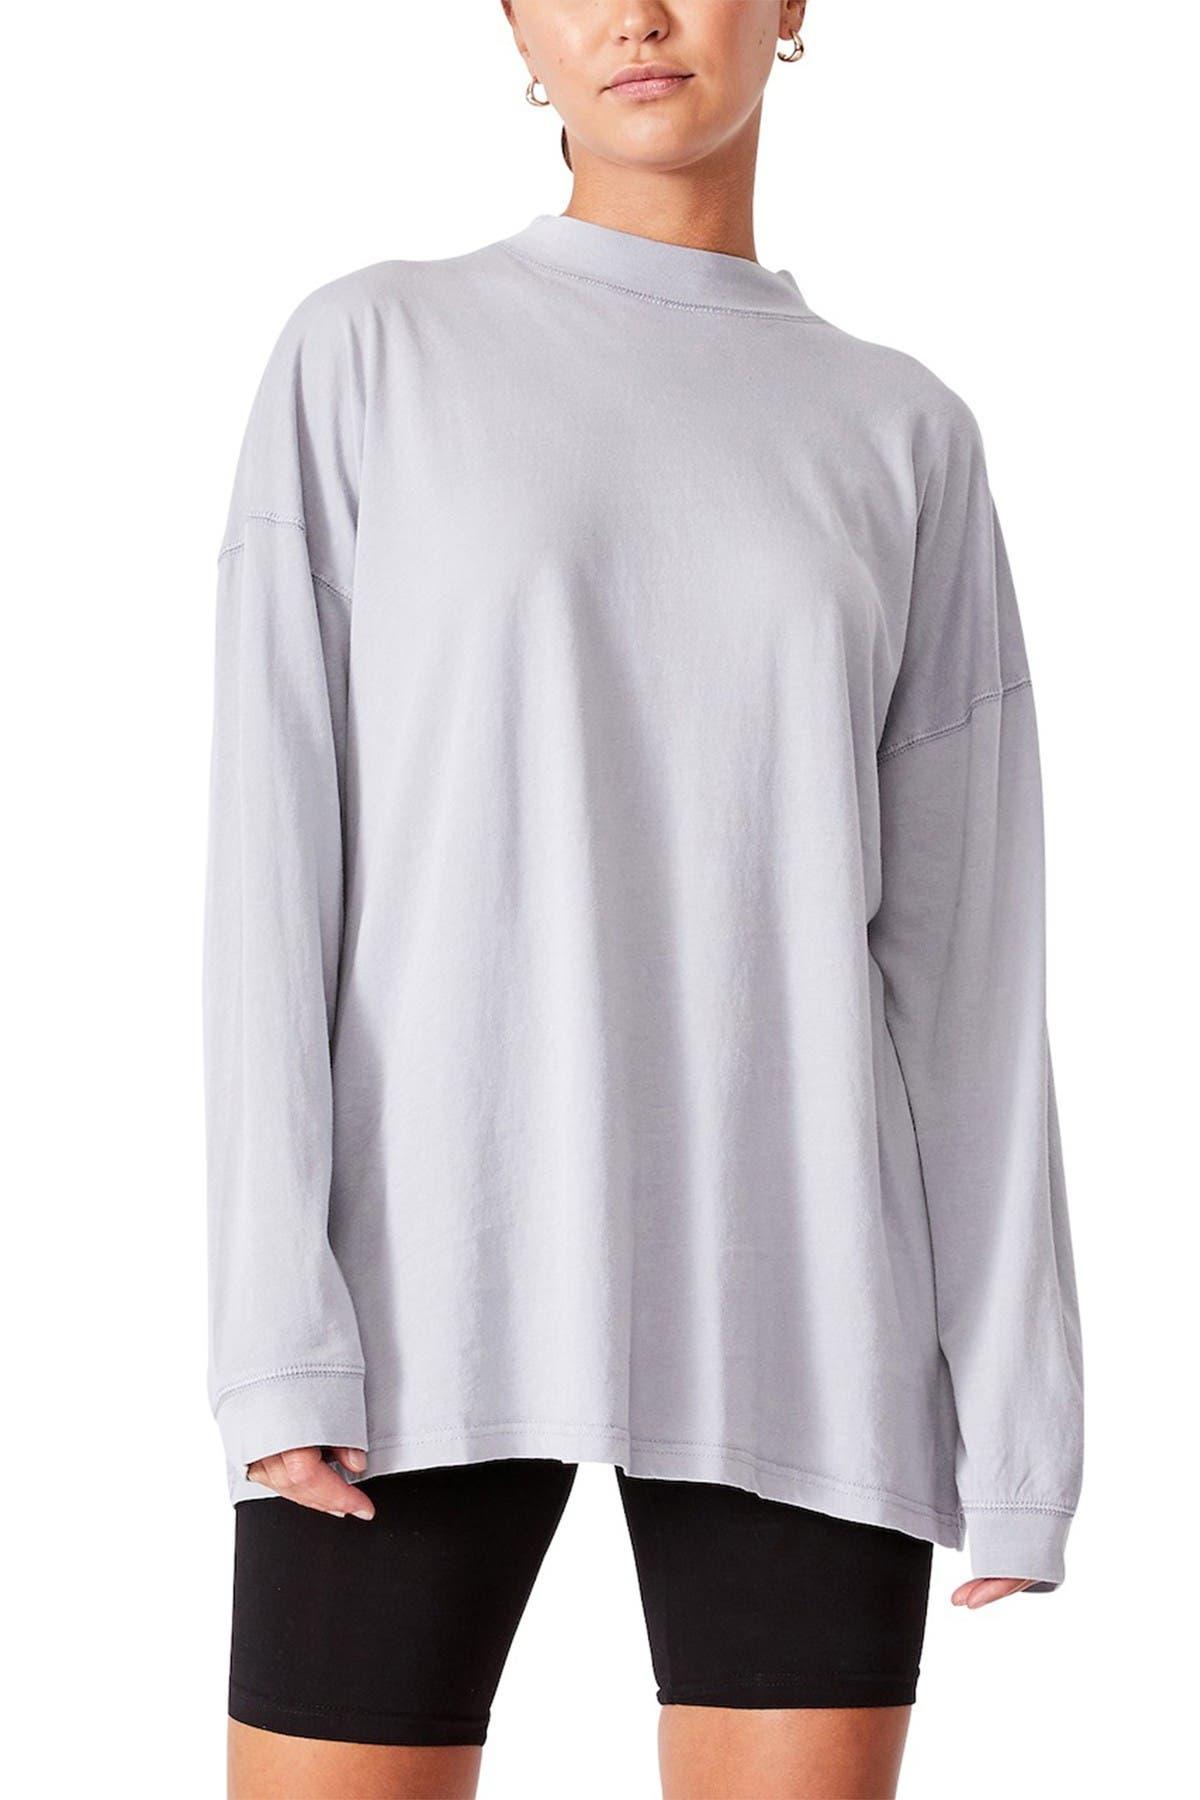 Cotton On 90s Longline Drop Shoulder Long Sleeve Top at Nordstrom Rack